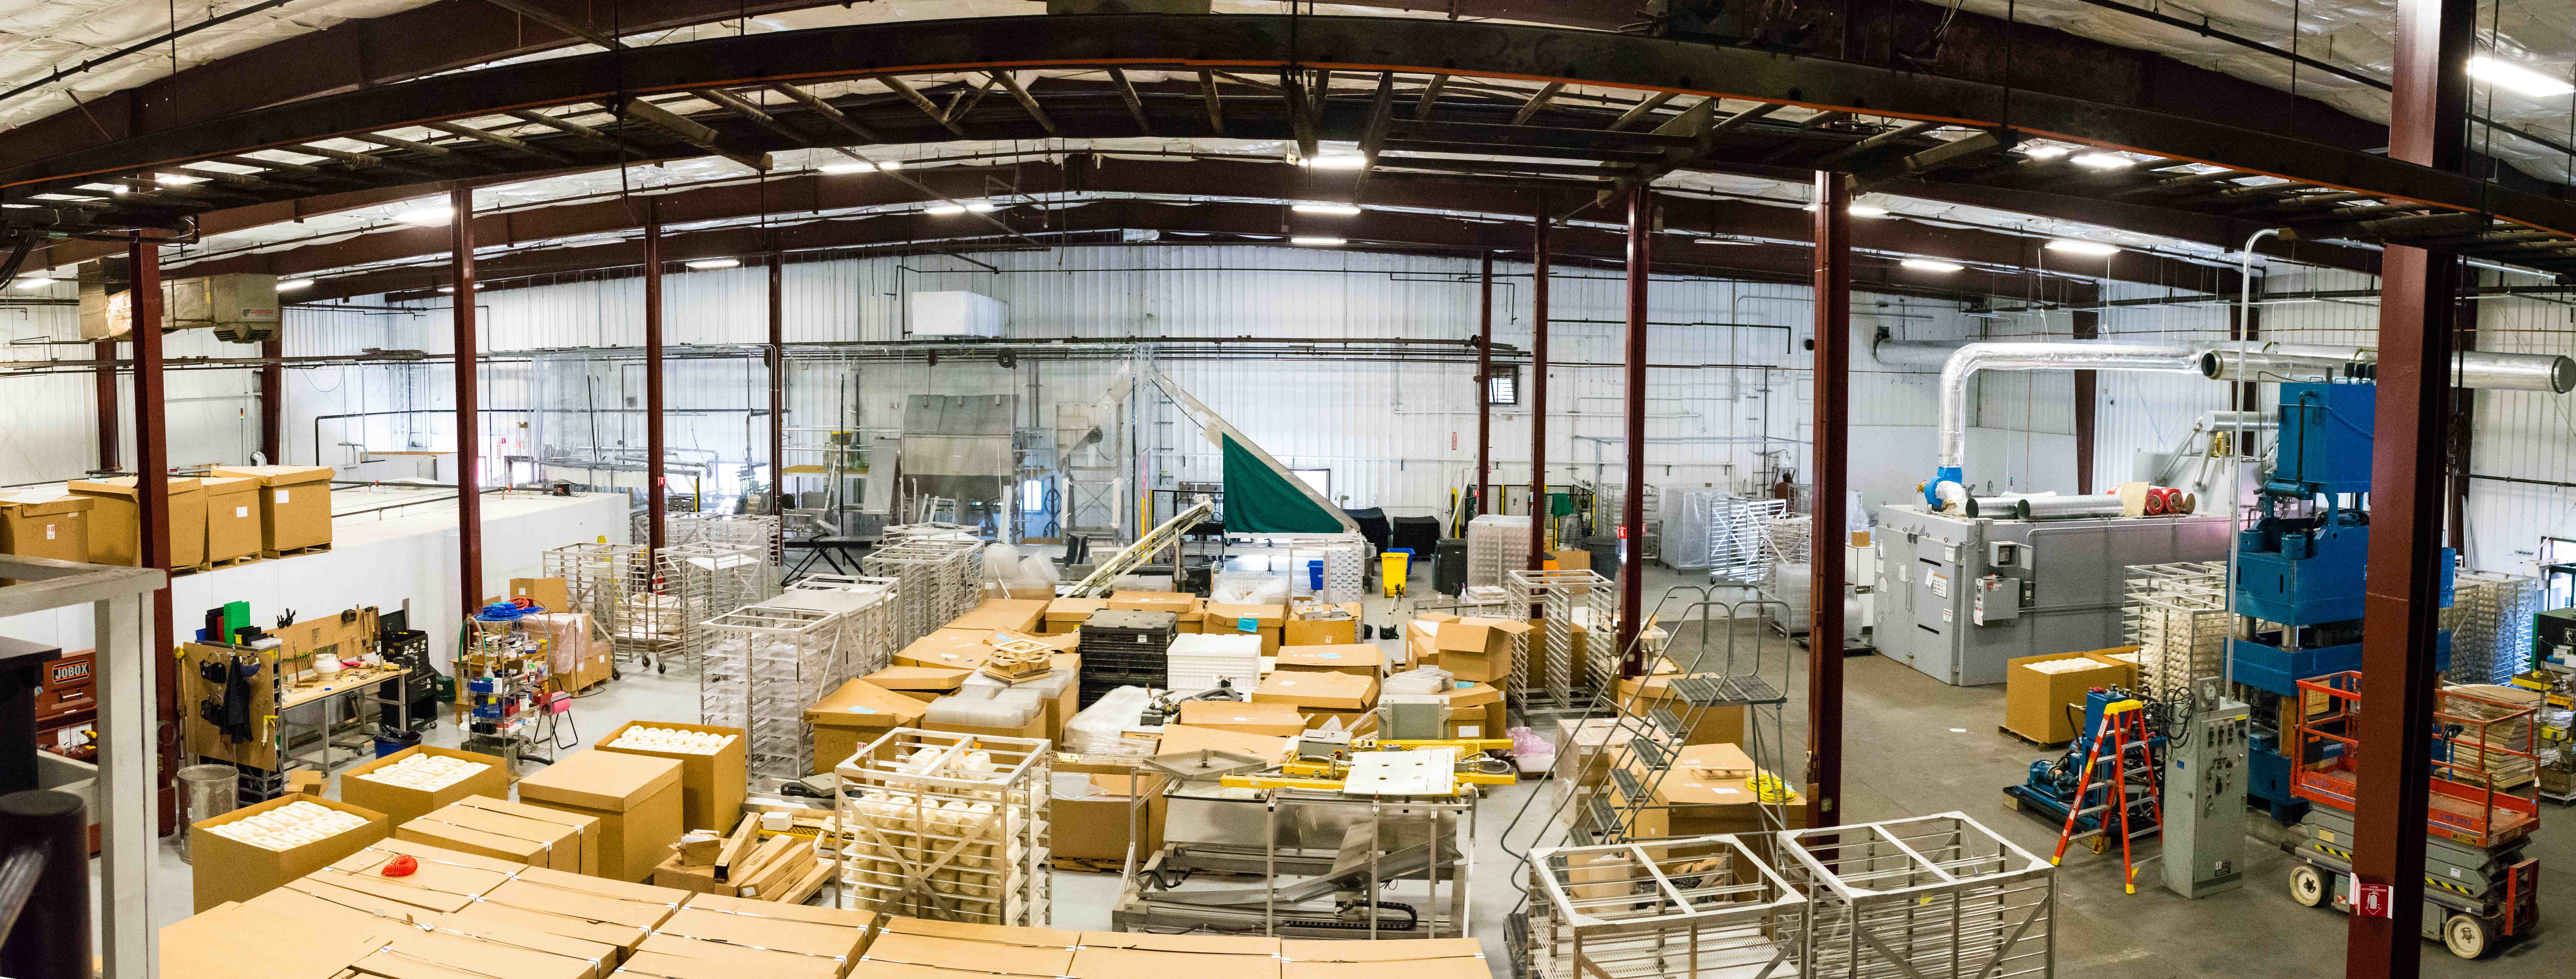 Inside Our Troy Facility Mycelium Biofabrication